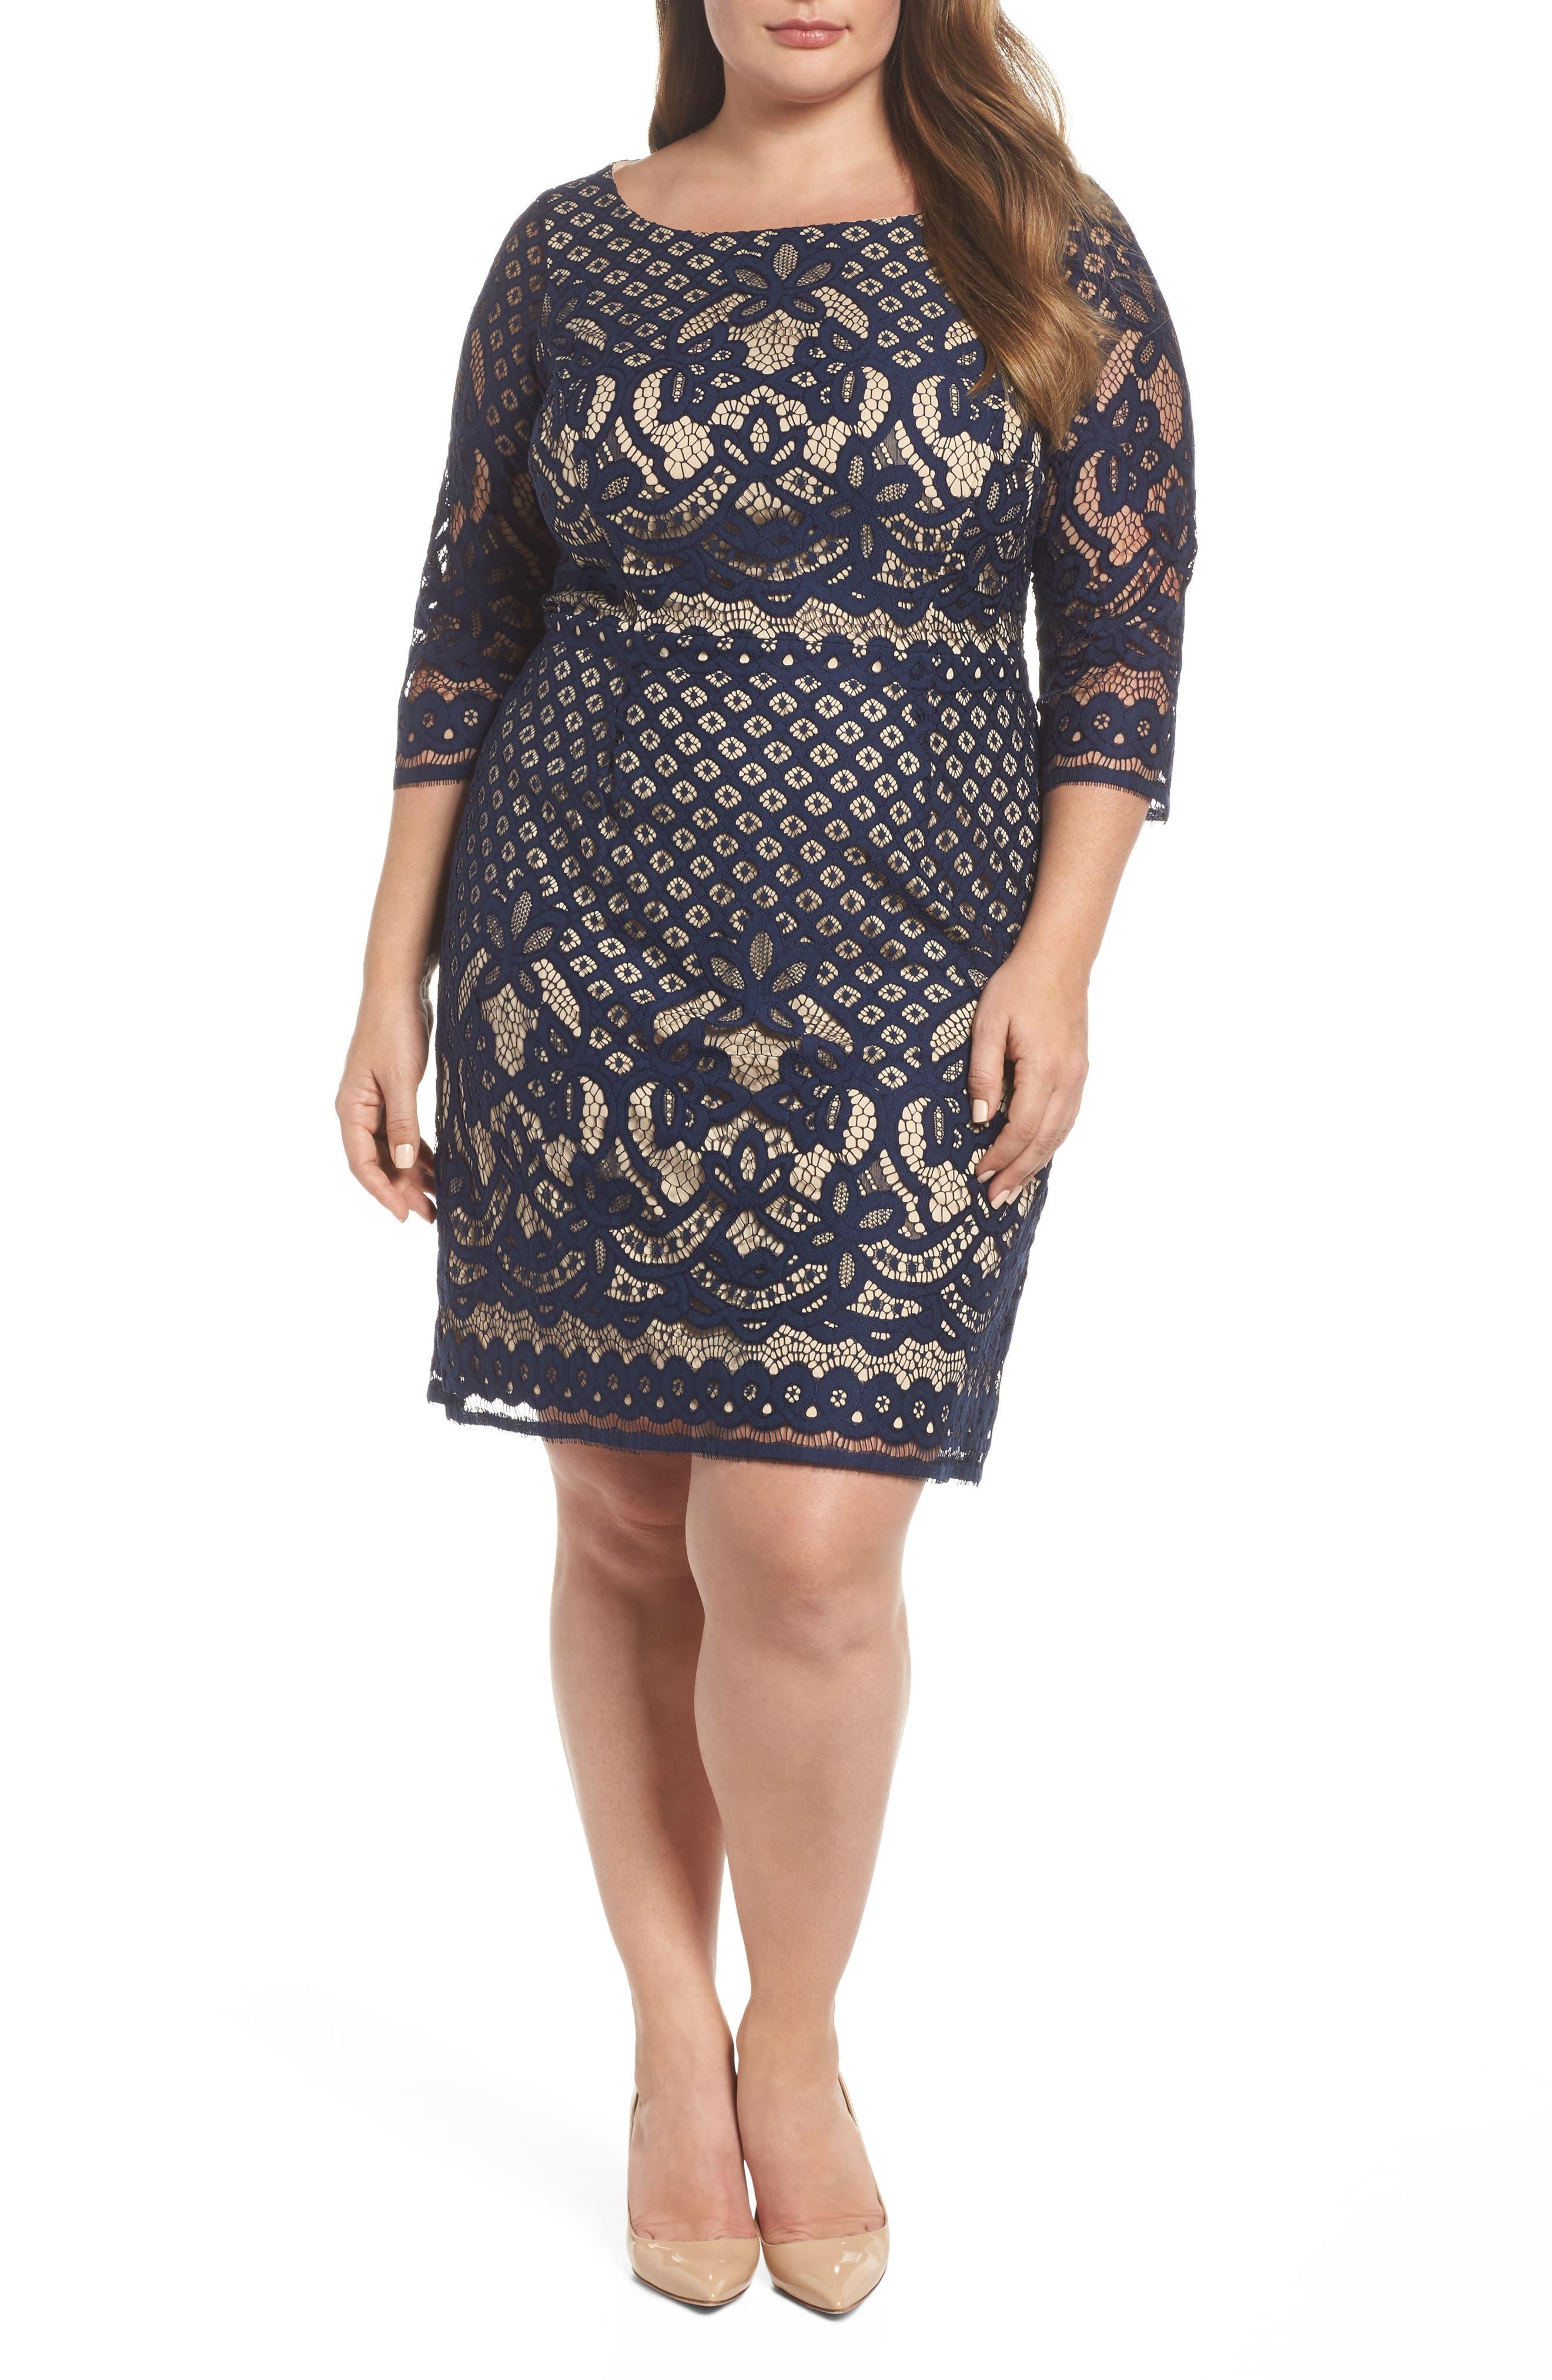 Gabby Skye Lace Sheath Dress (Plus Size)